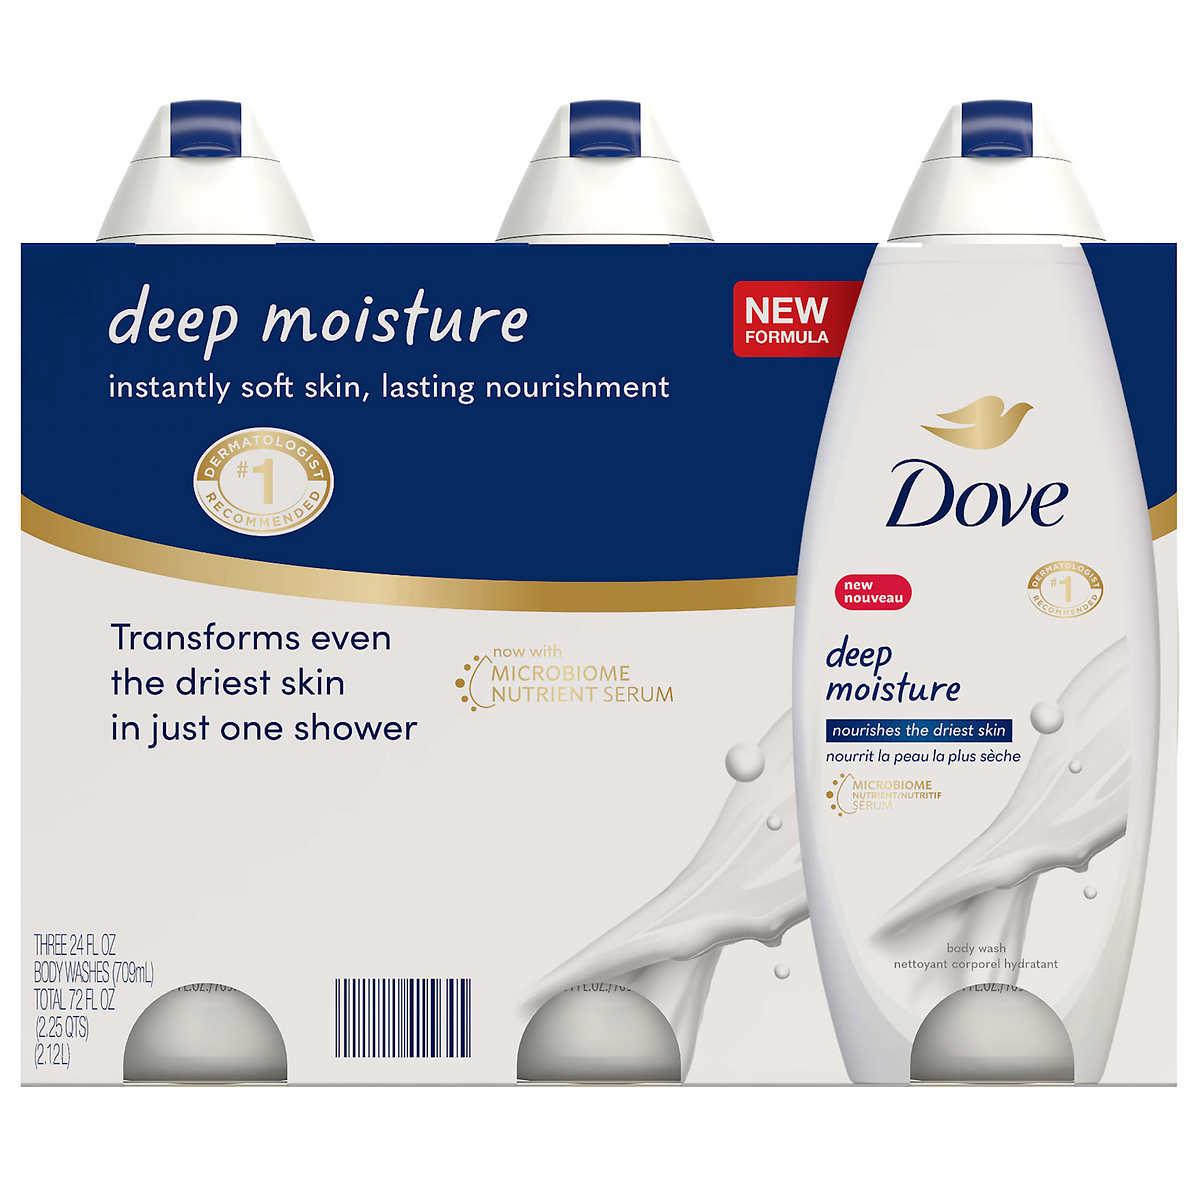 Dove Deep Moisture Bodywash 24 Oz 3 Pack